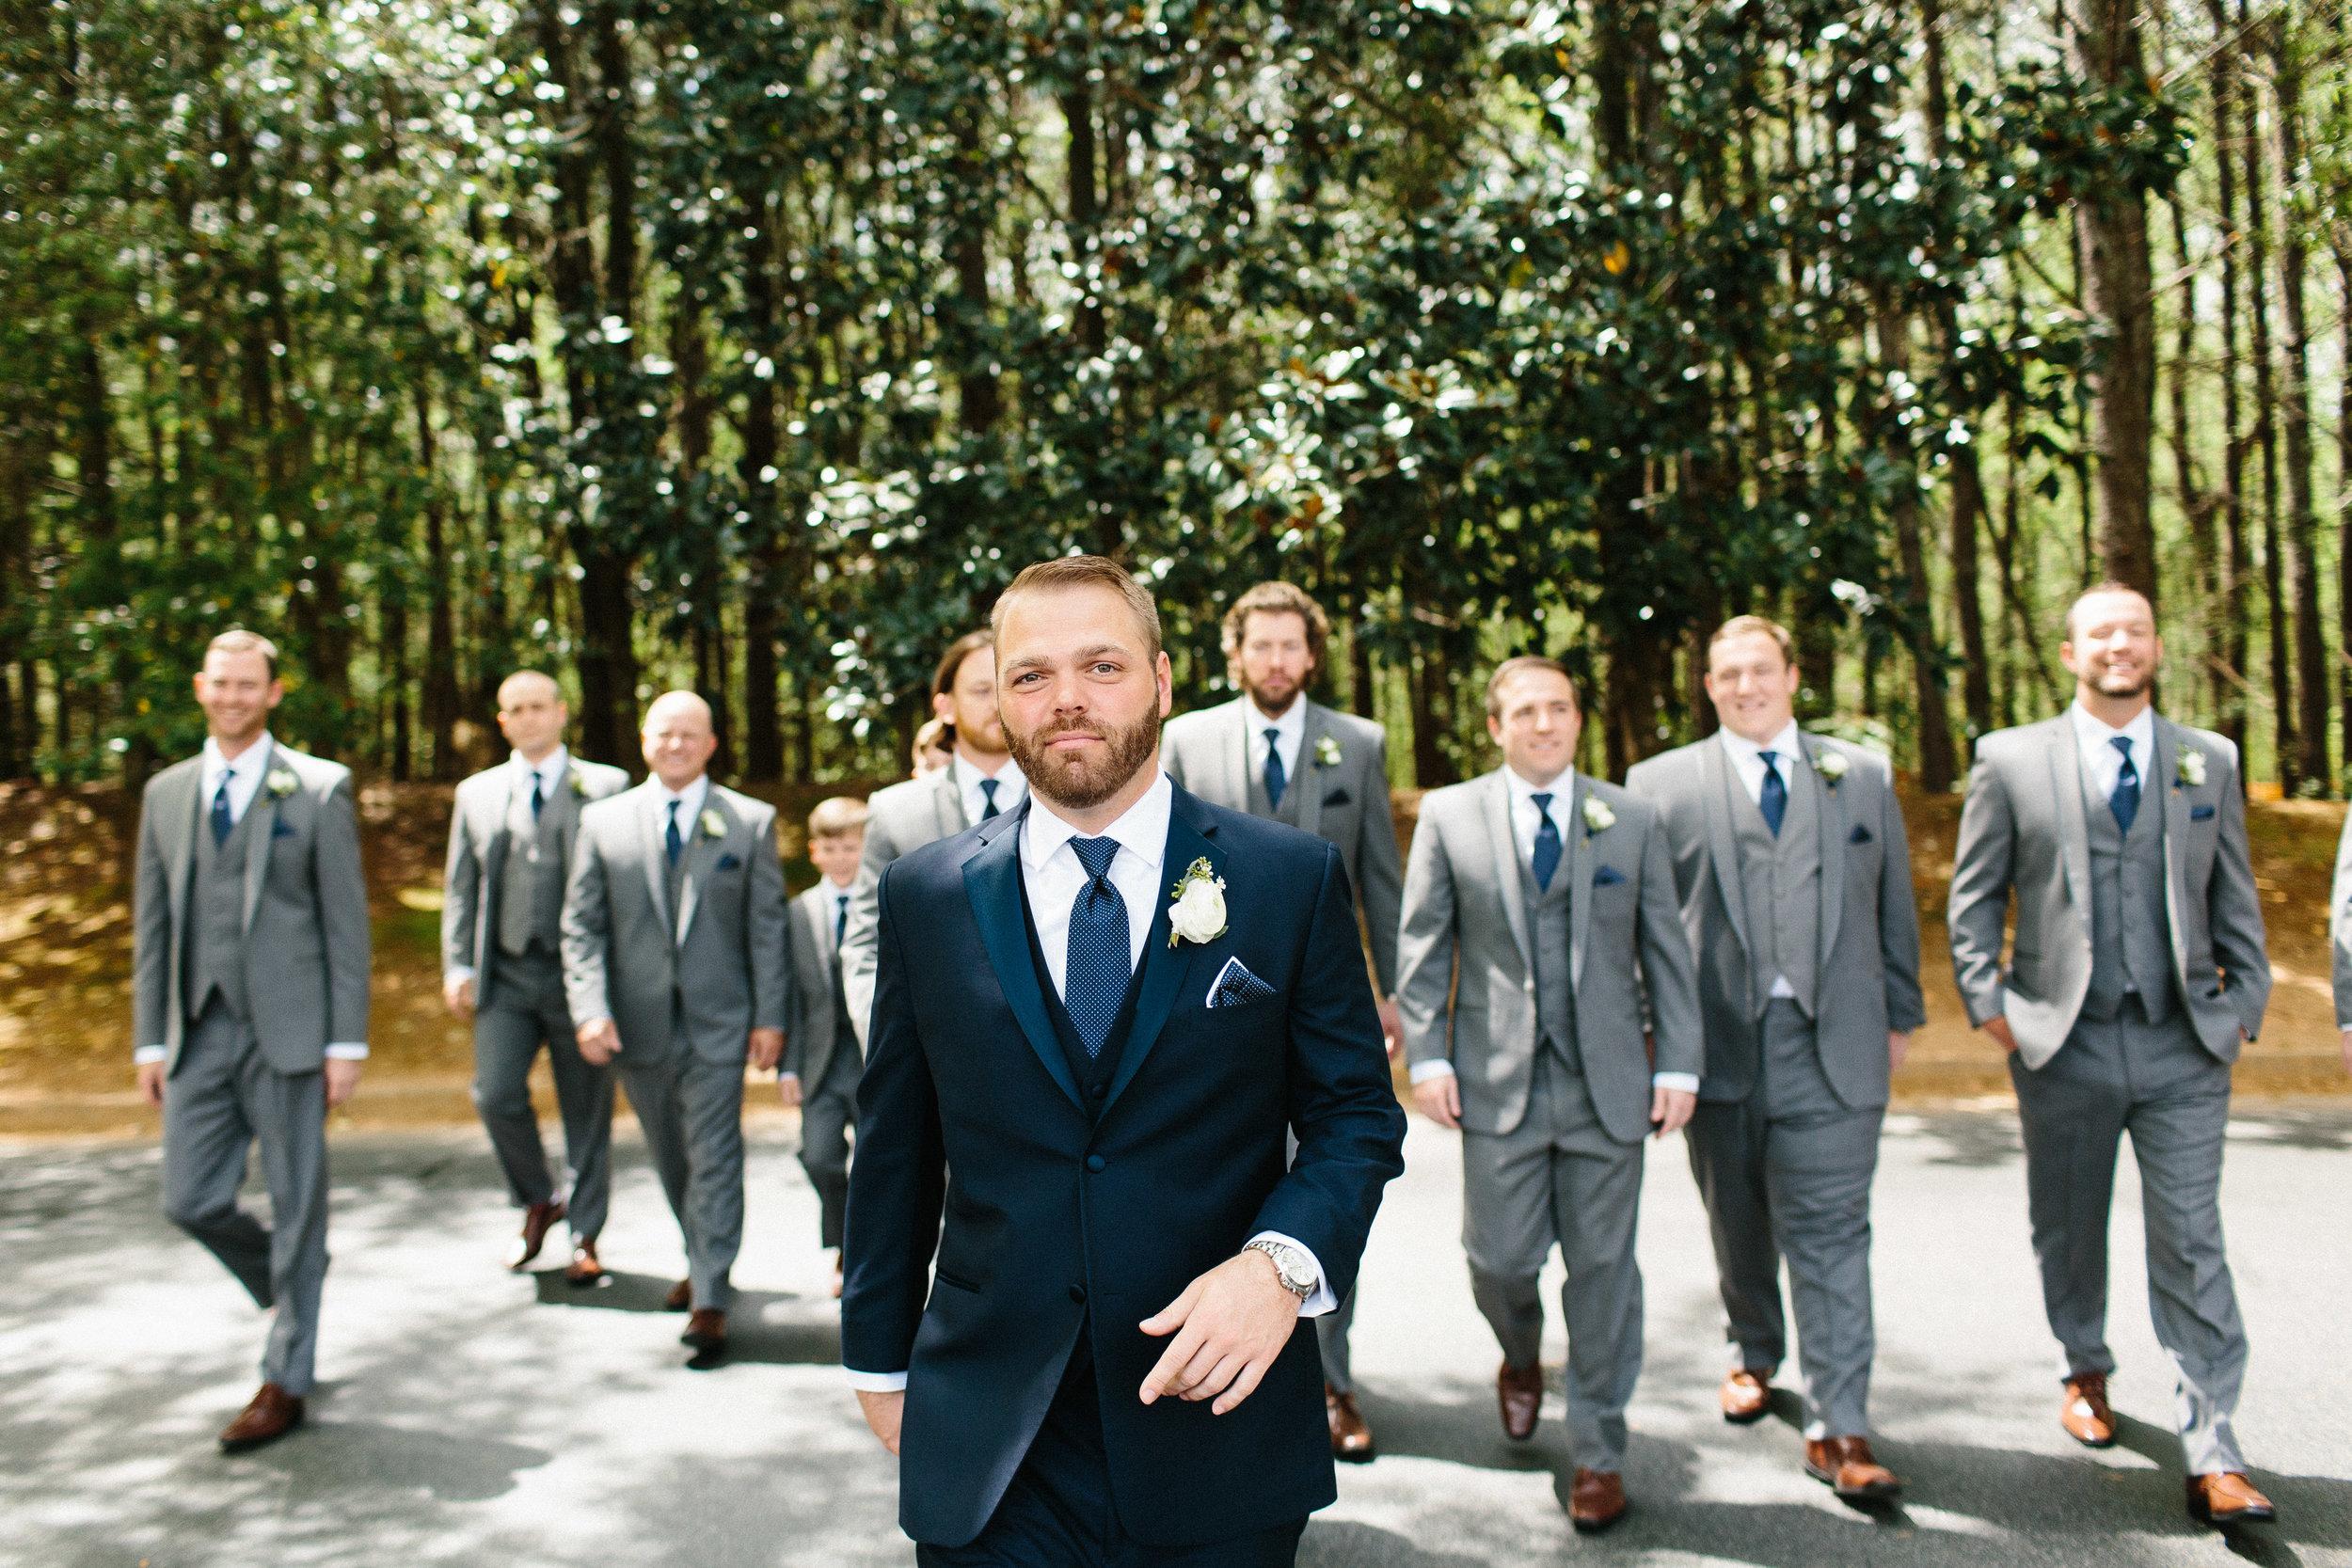 roswell_st_peter_chanel_catholic_avalon_hotel_alpharetta_wedding-1310.jpg